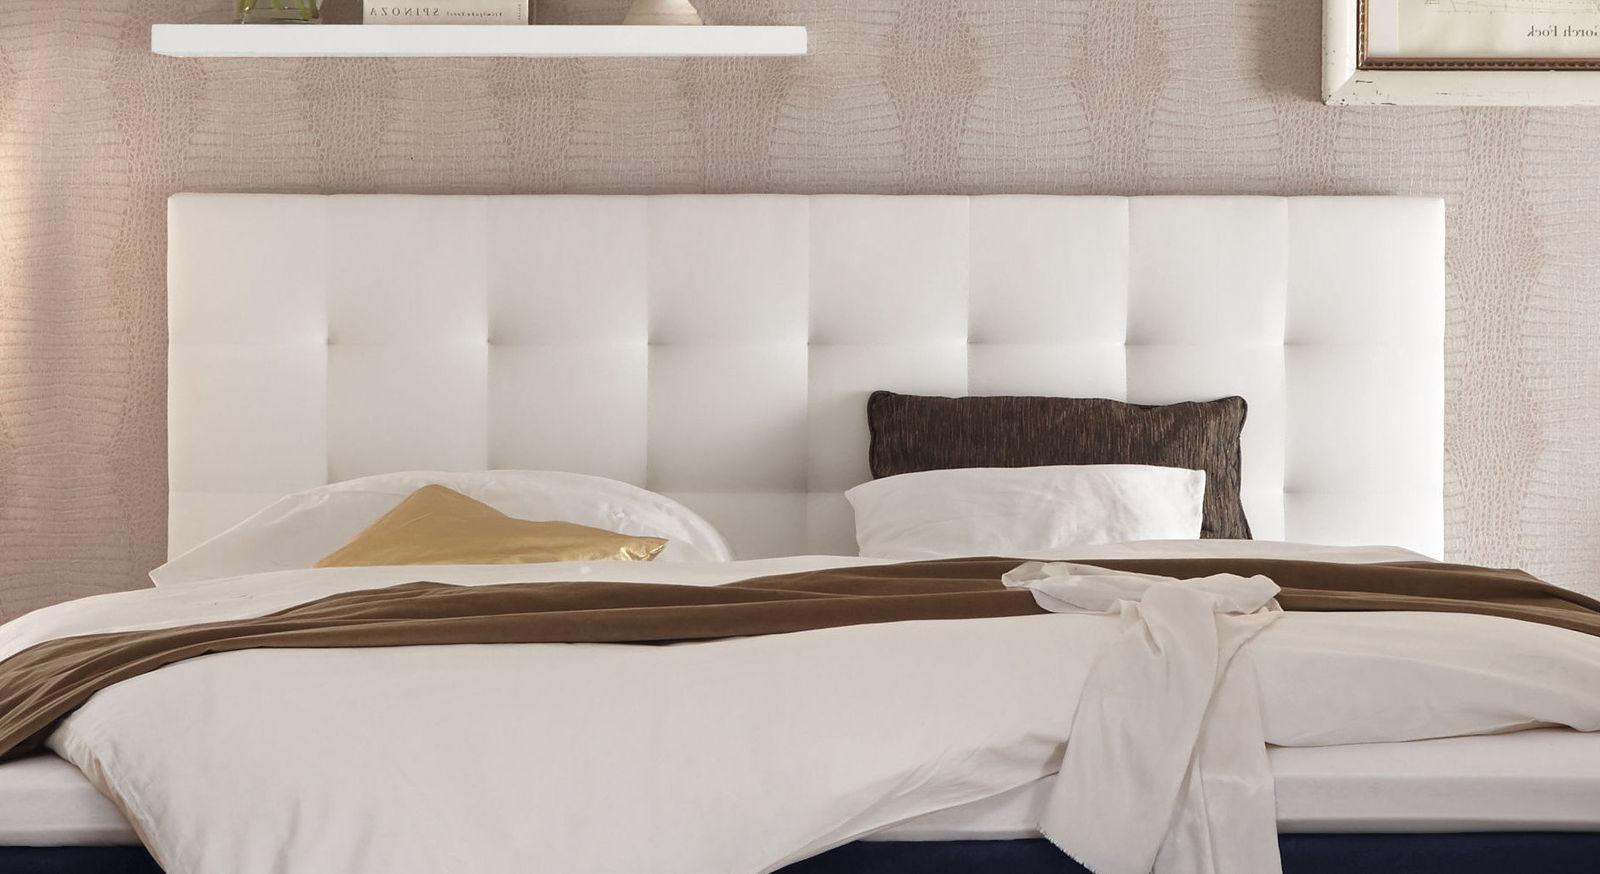 boxspringbett mit schubladen und samt kunstleder bezug selca. Black Bedroom Furniture Sets. Home Design Ideas